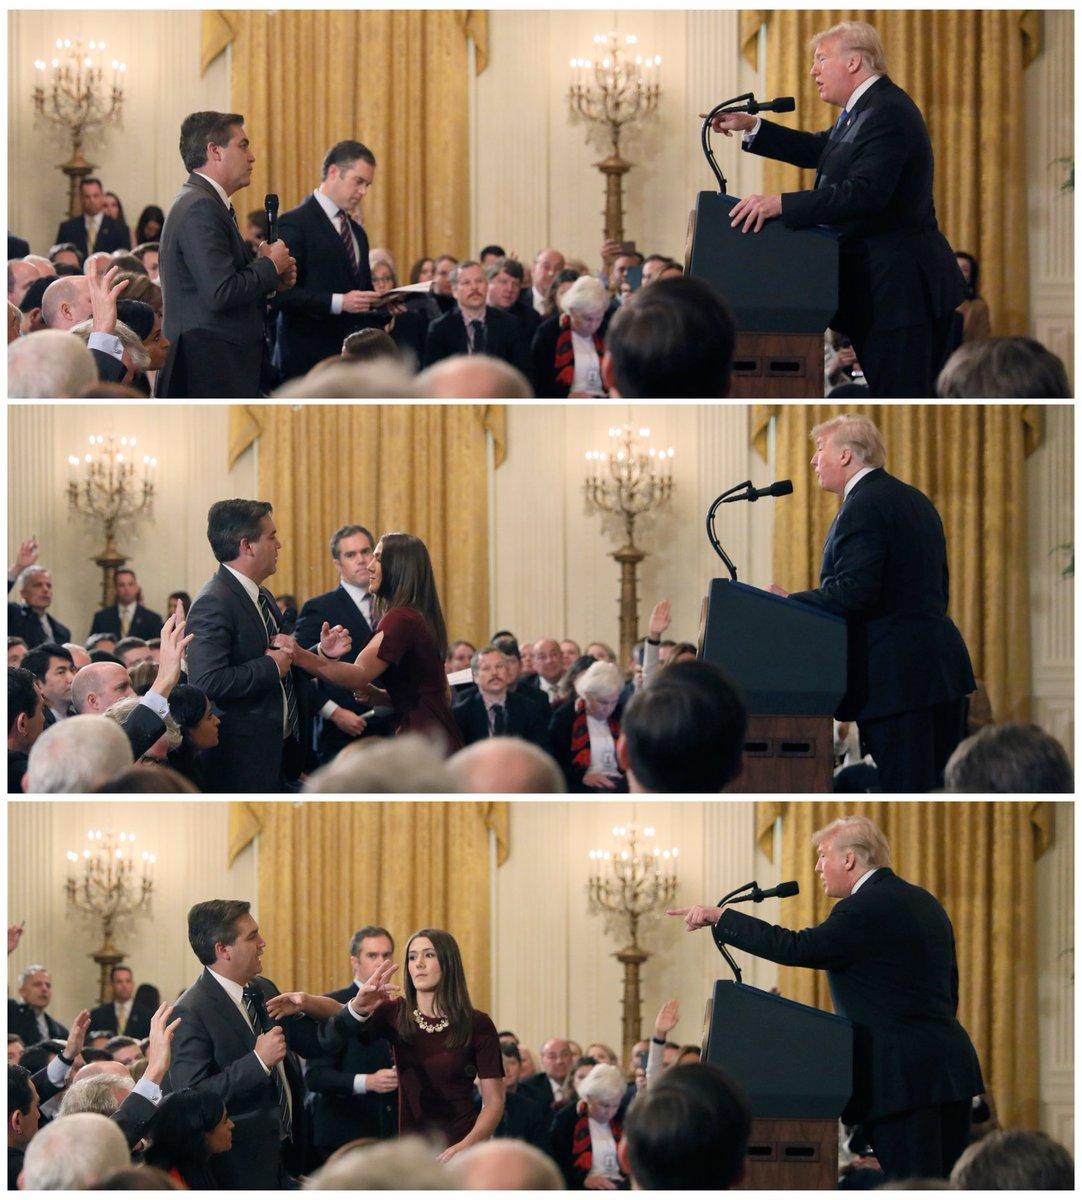 Casa Blanca truquea video para atacar a periodista